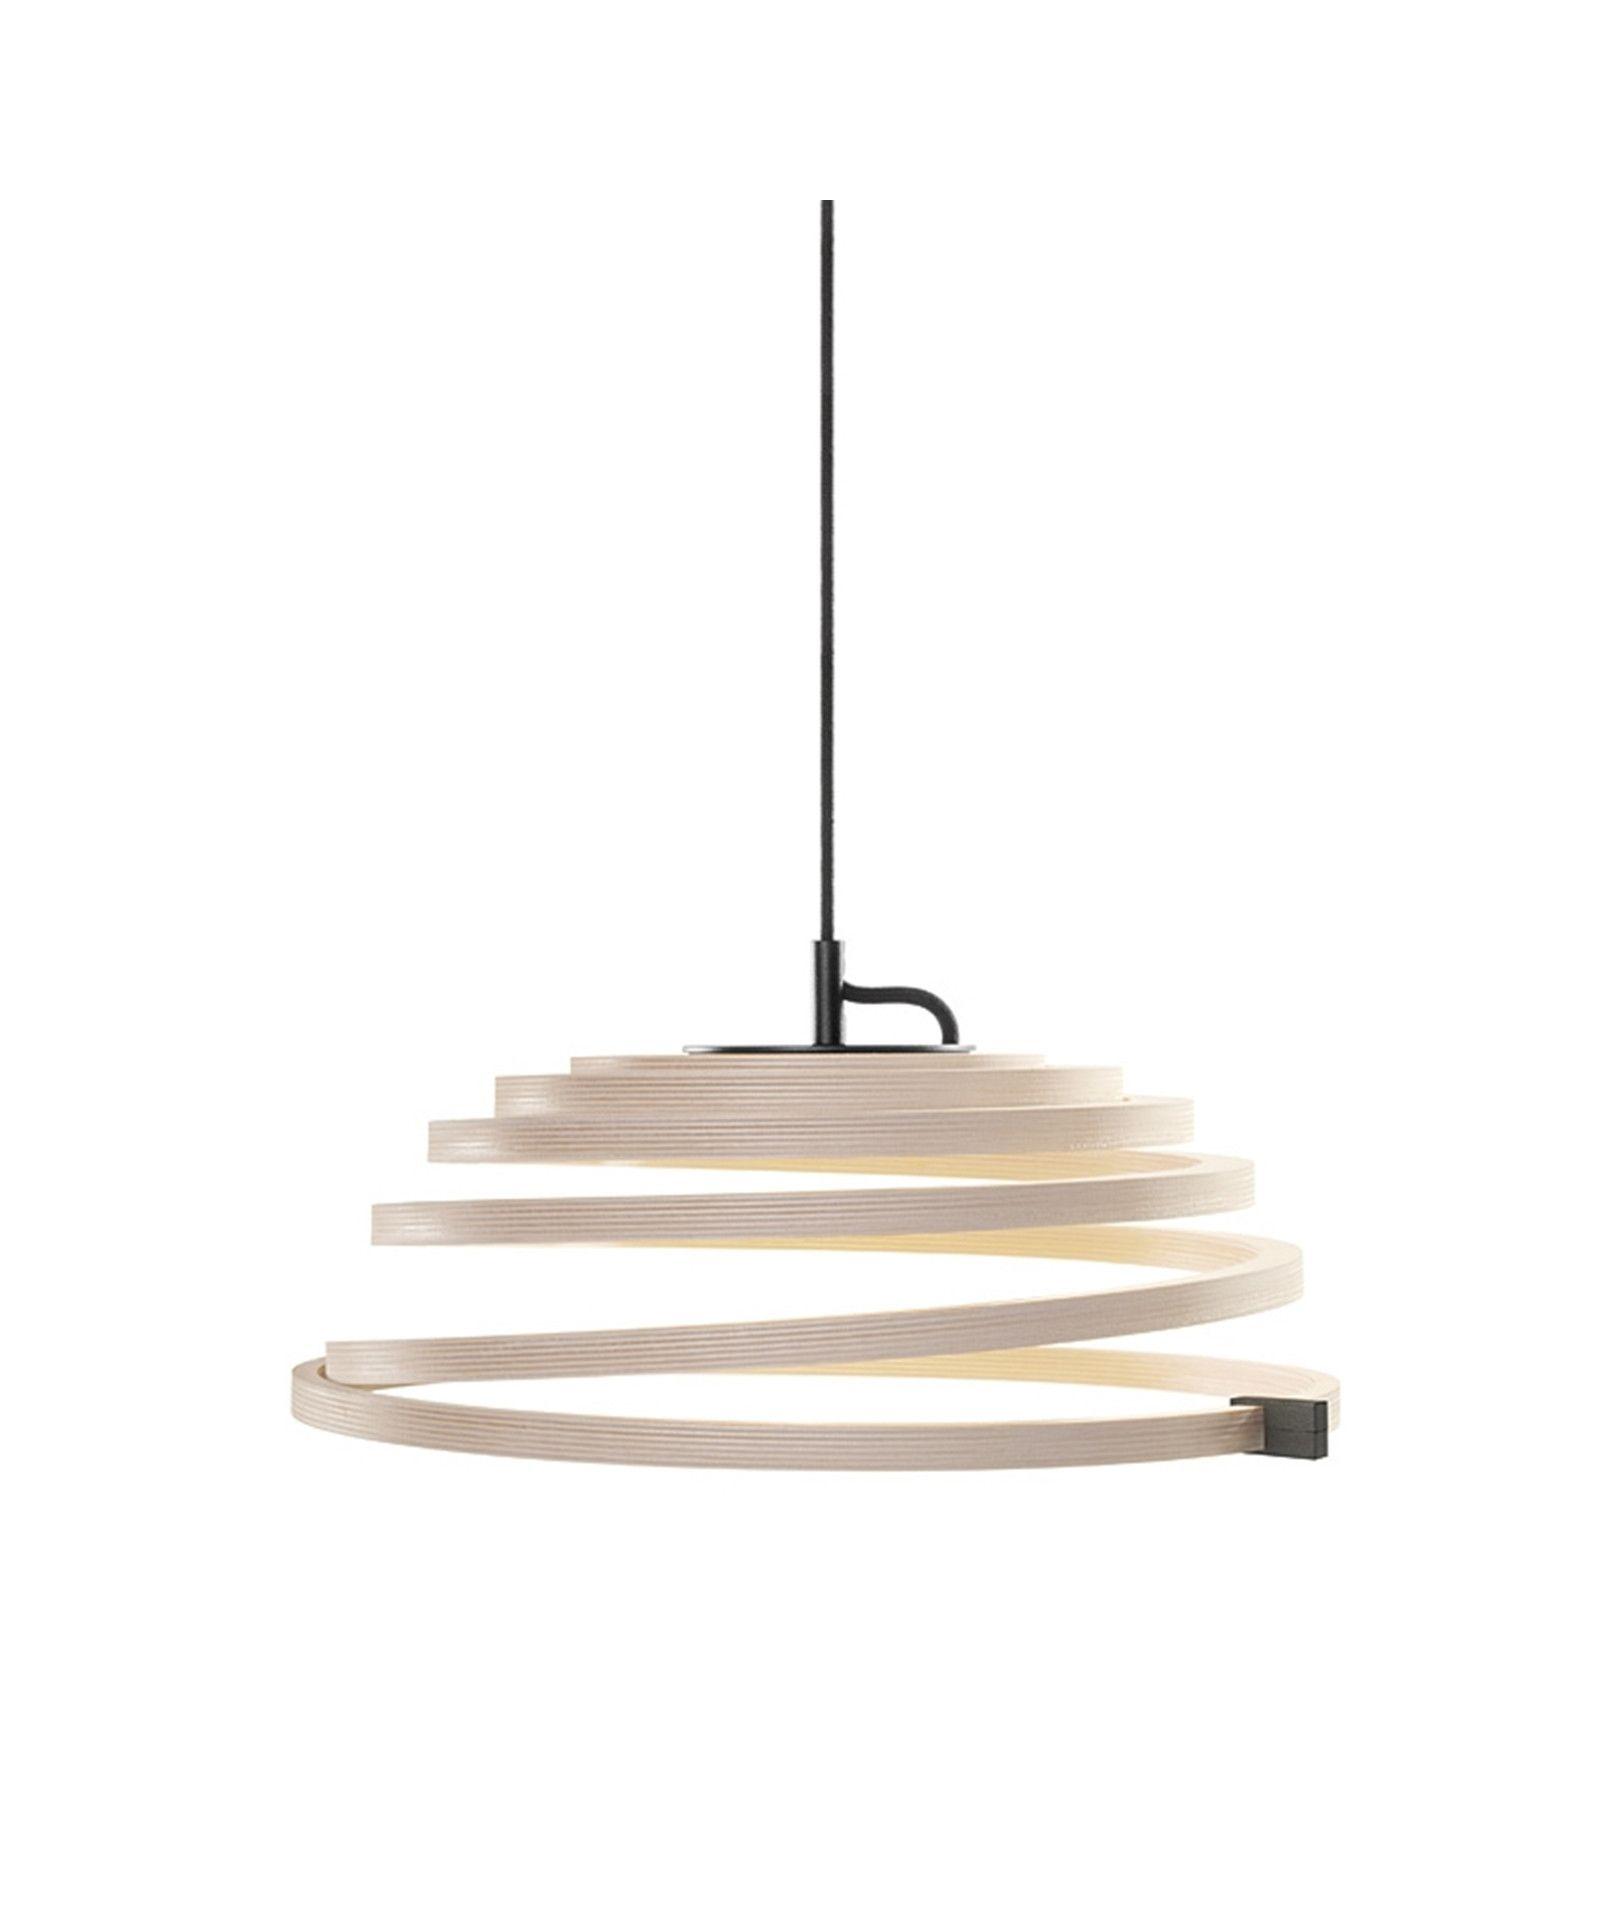 Aspiro 8000 Pendel Birk Sort Ledning Secto Pendel Skandinavisk Design Lamper